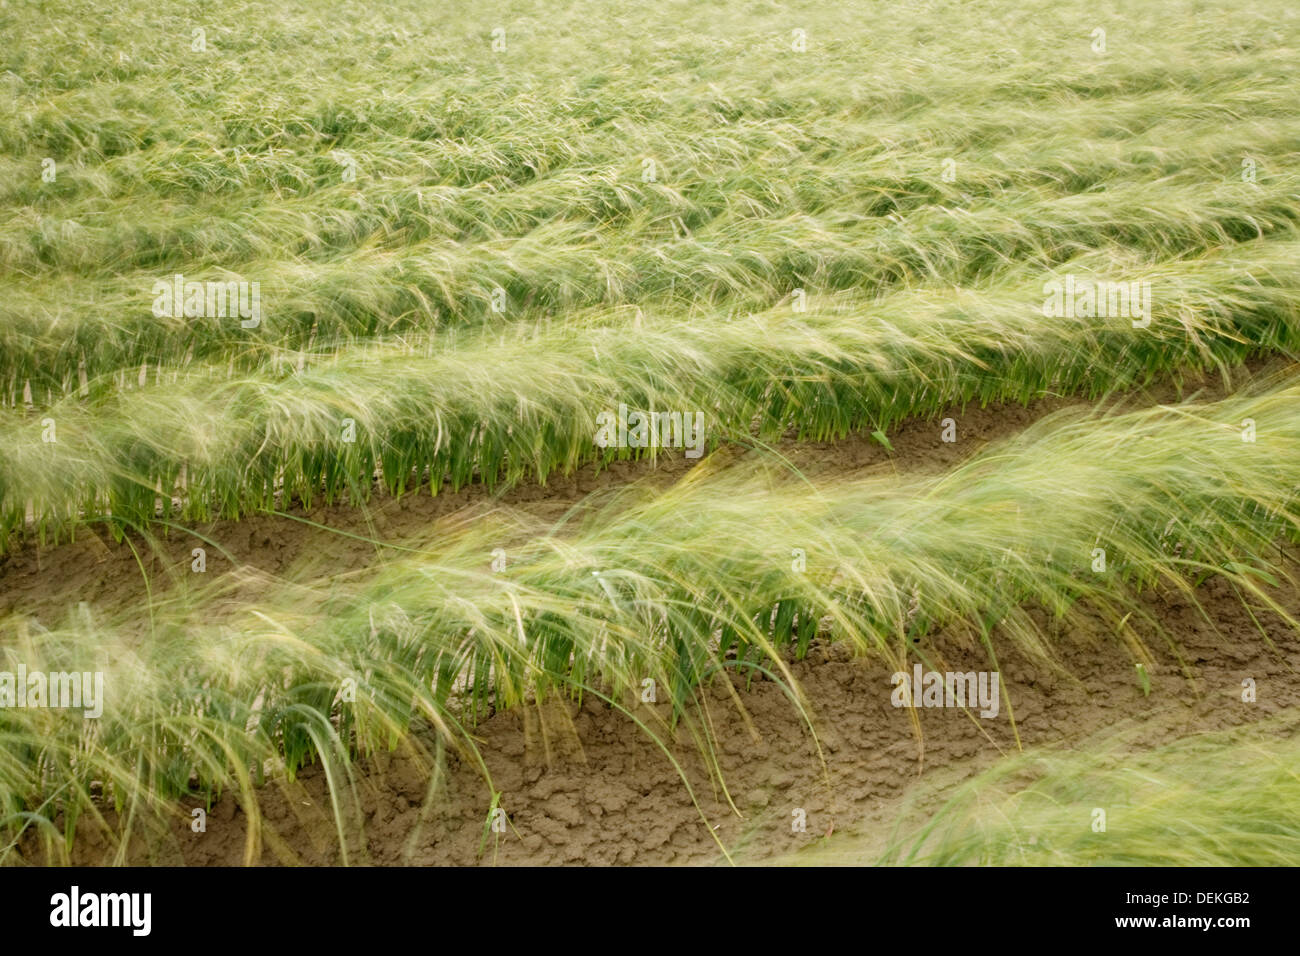 Tall iris grass growing in crop field - Stock Image